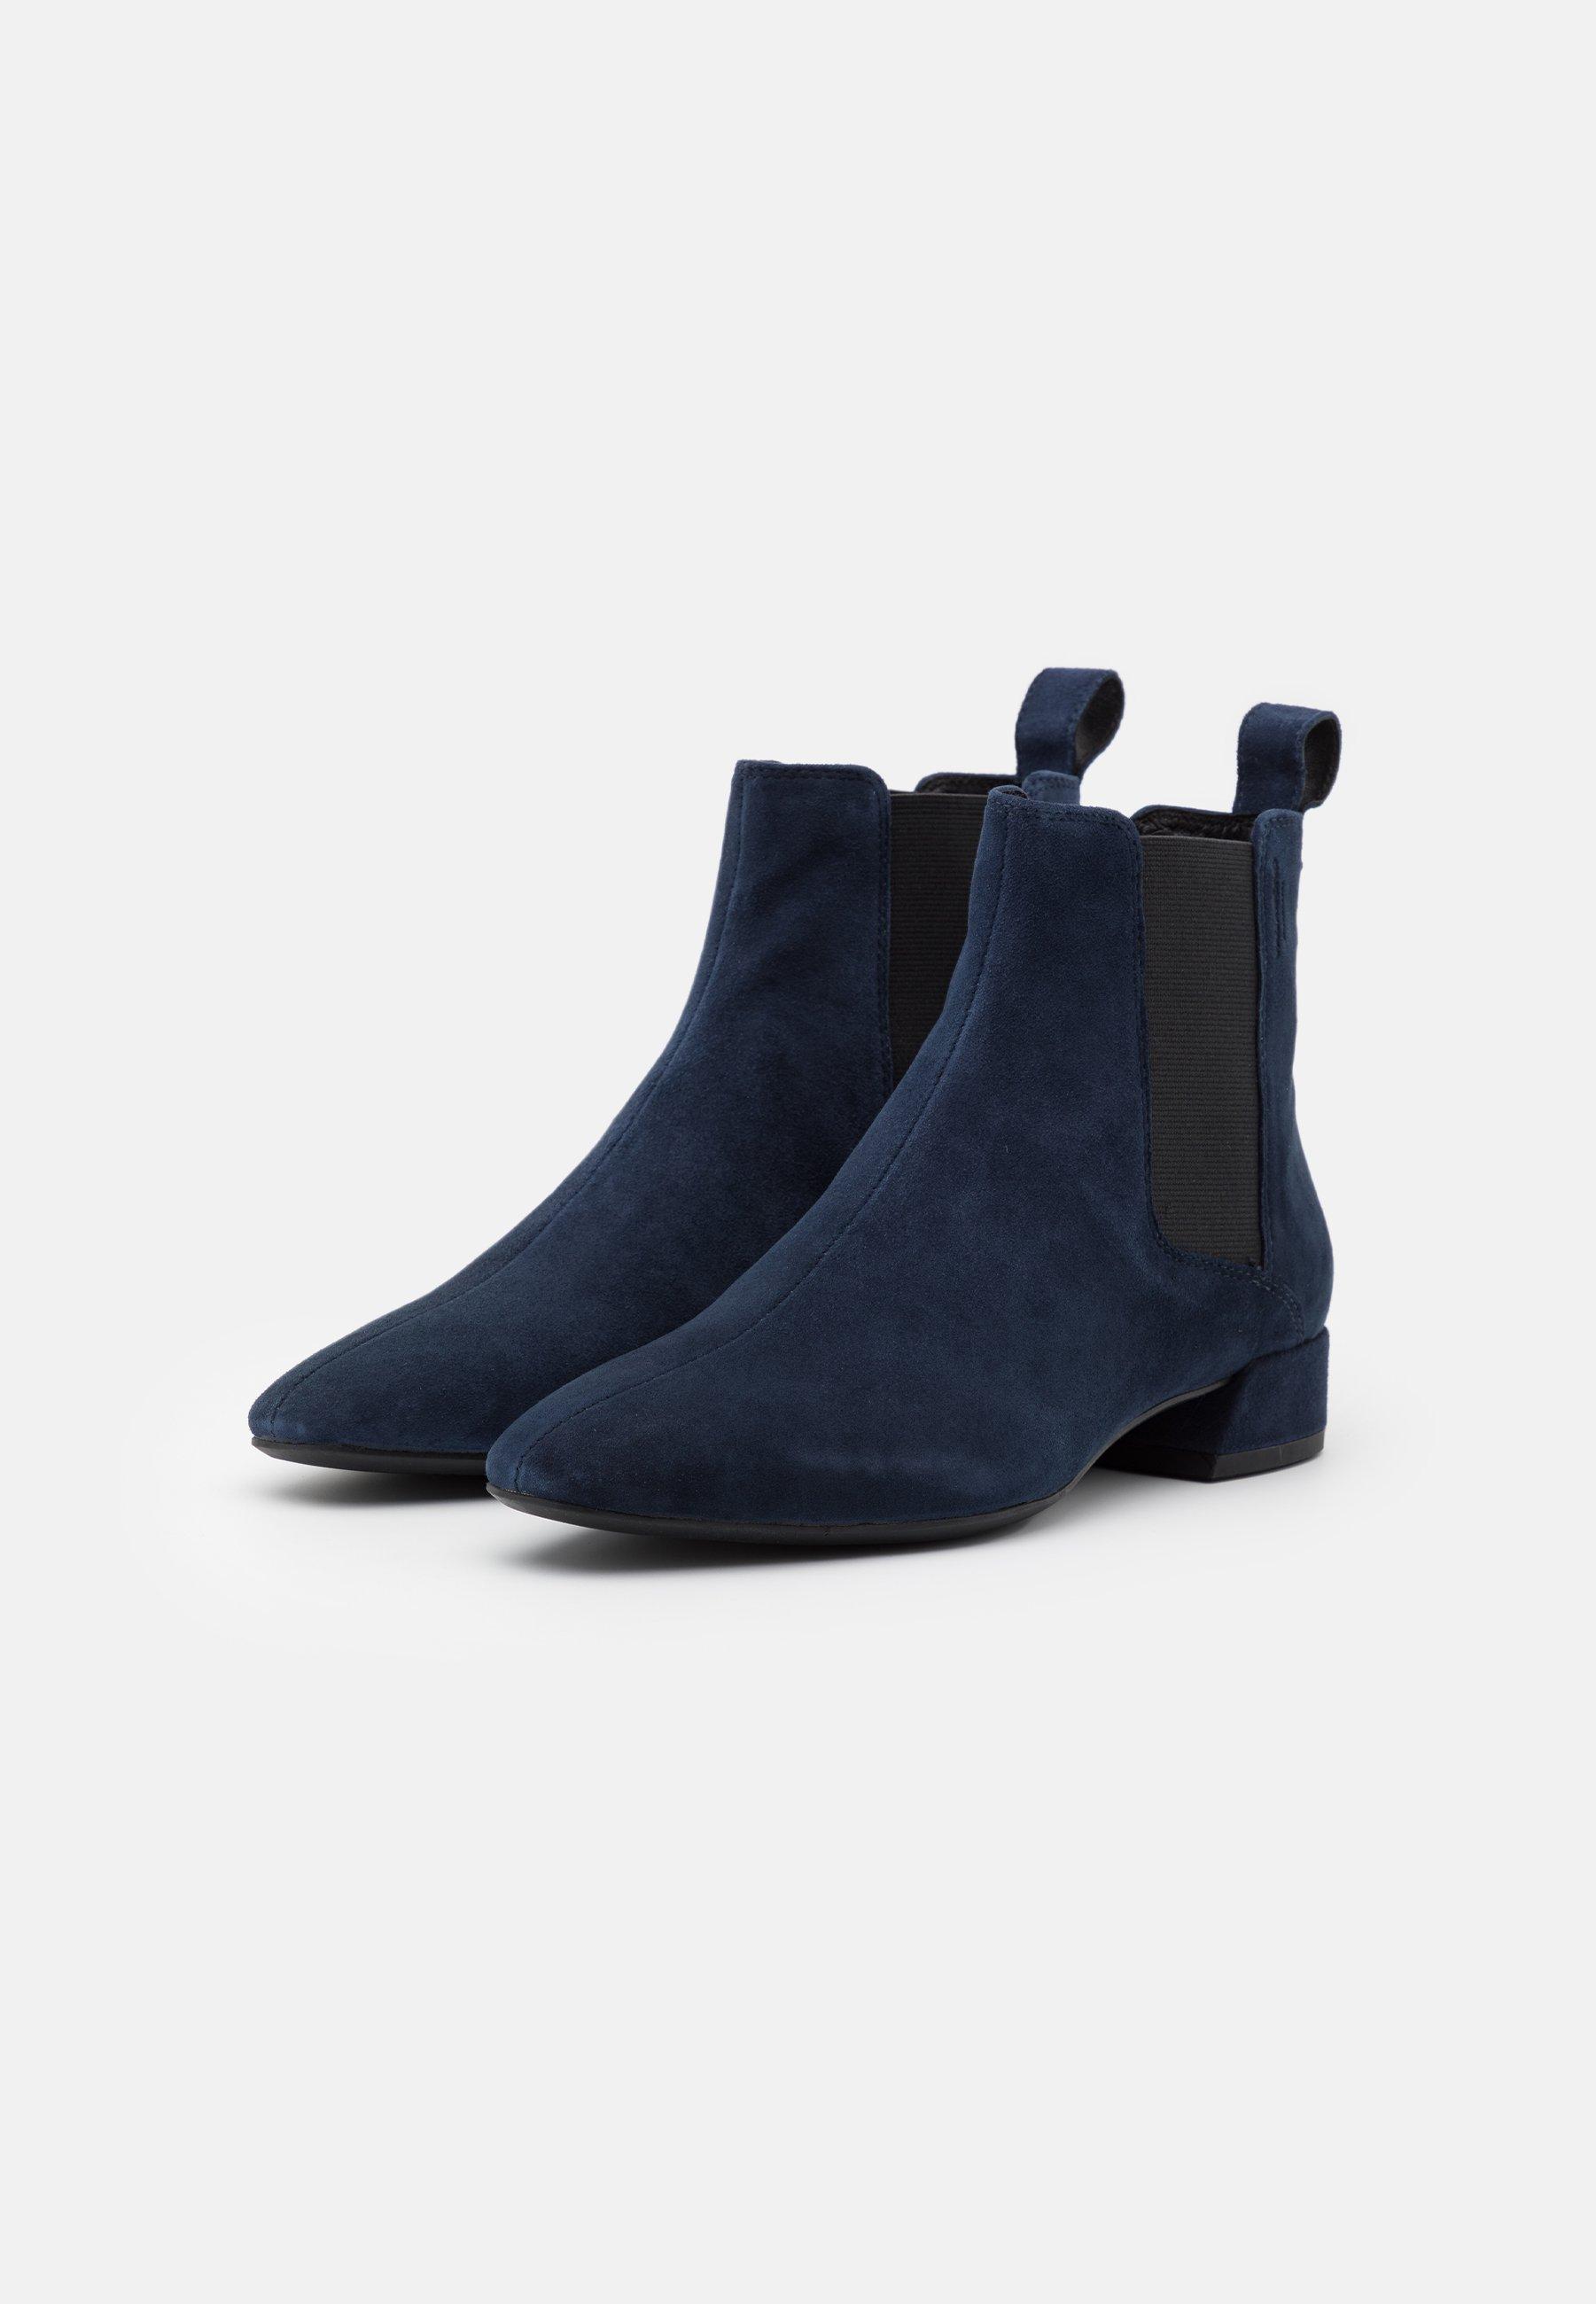 Vagabond JOYCE Stiefelette dark blue/blau